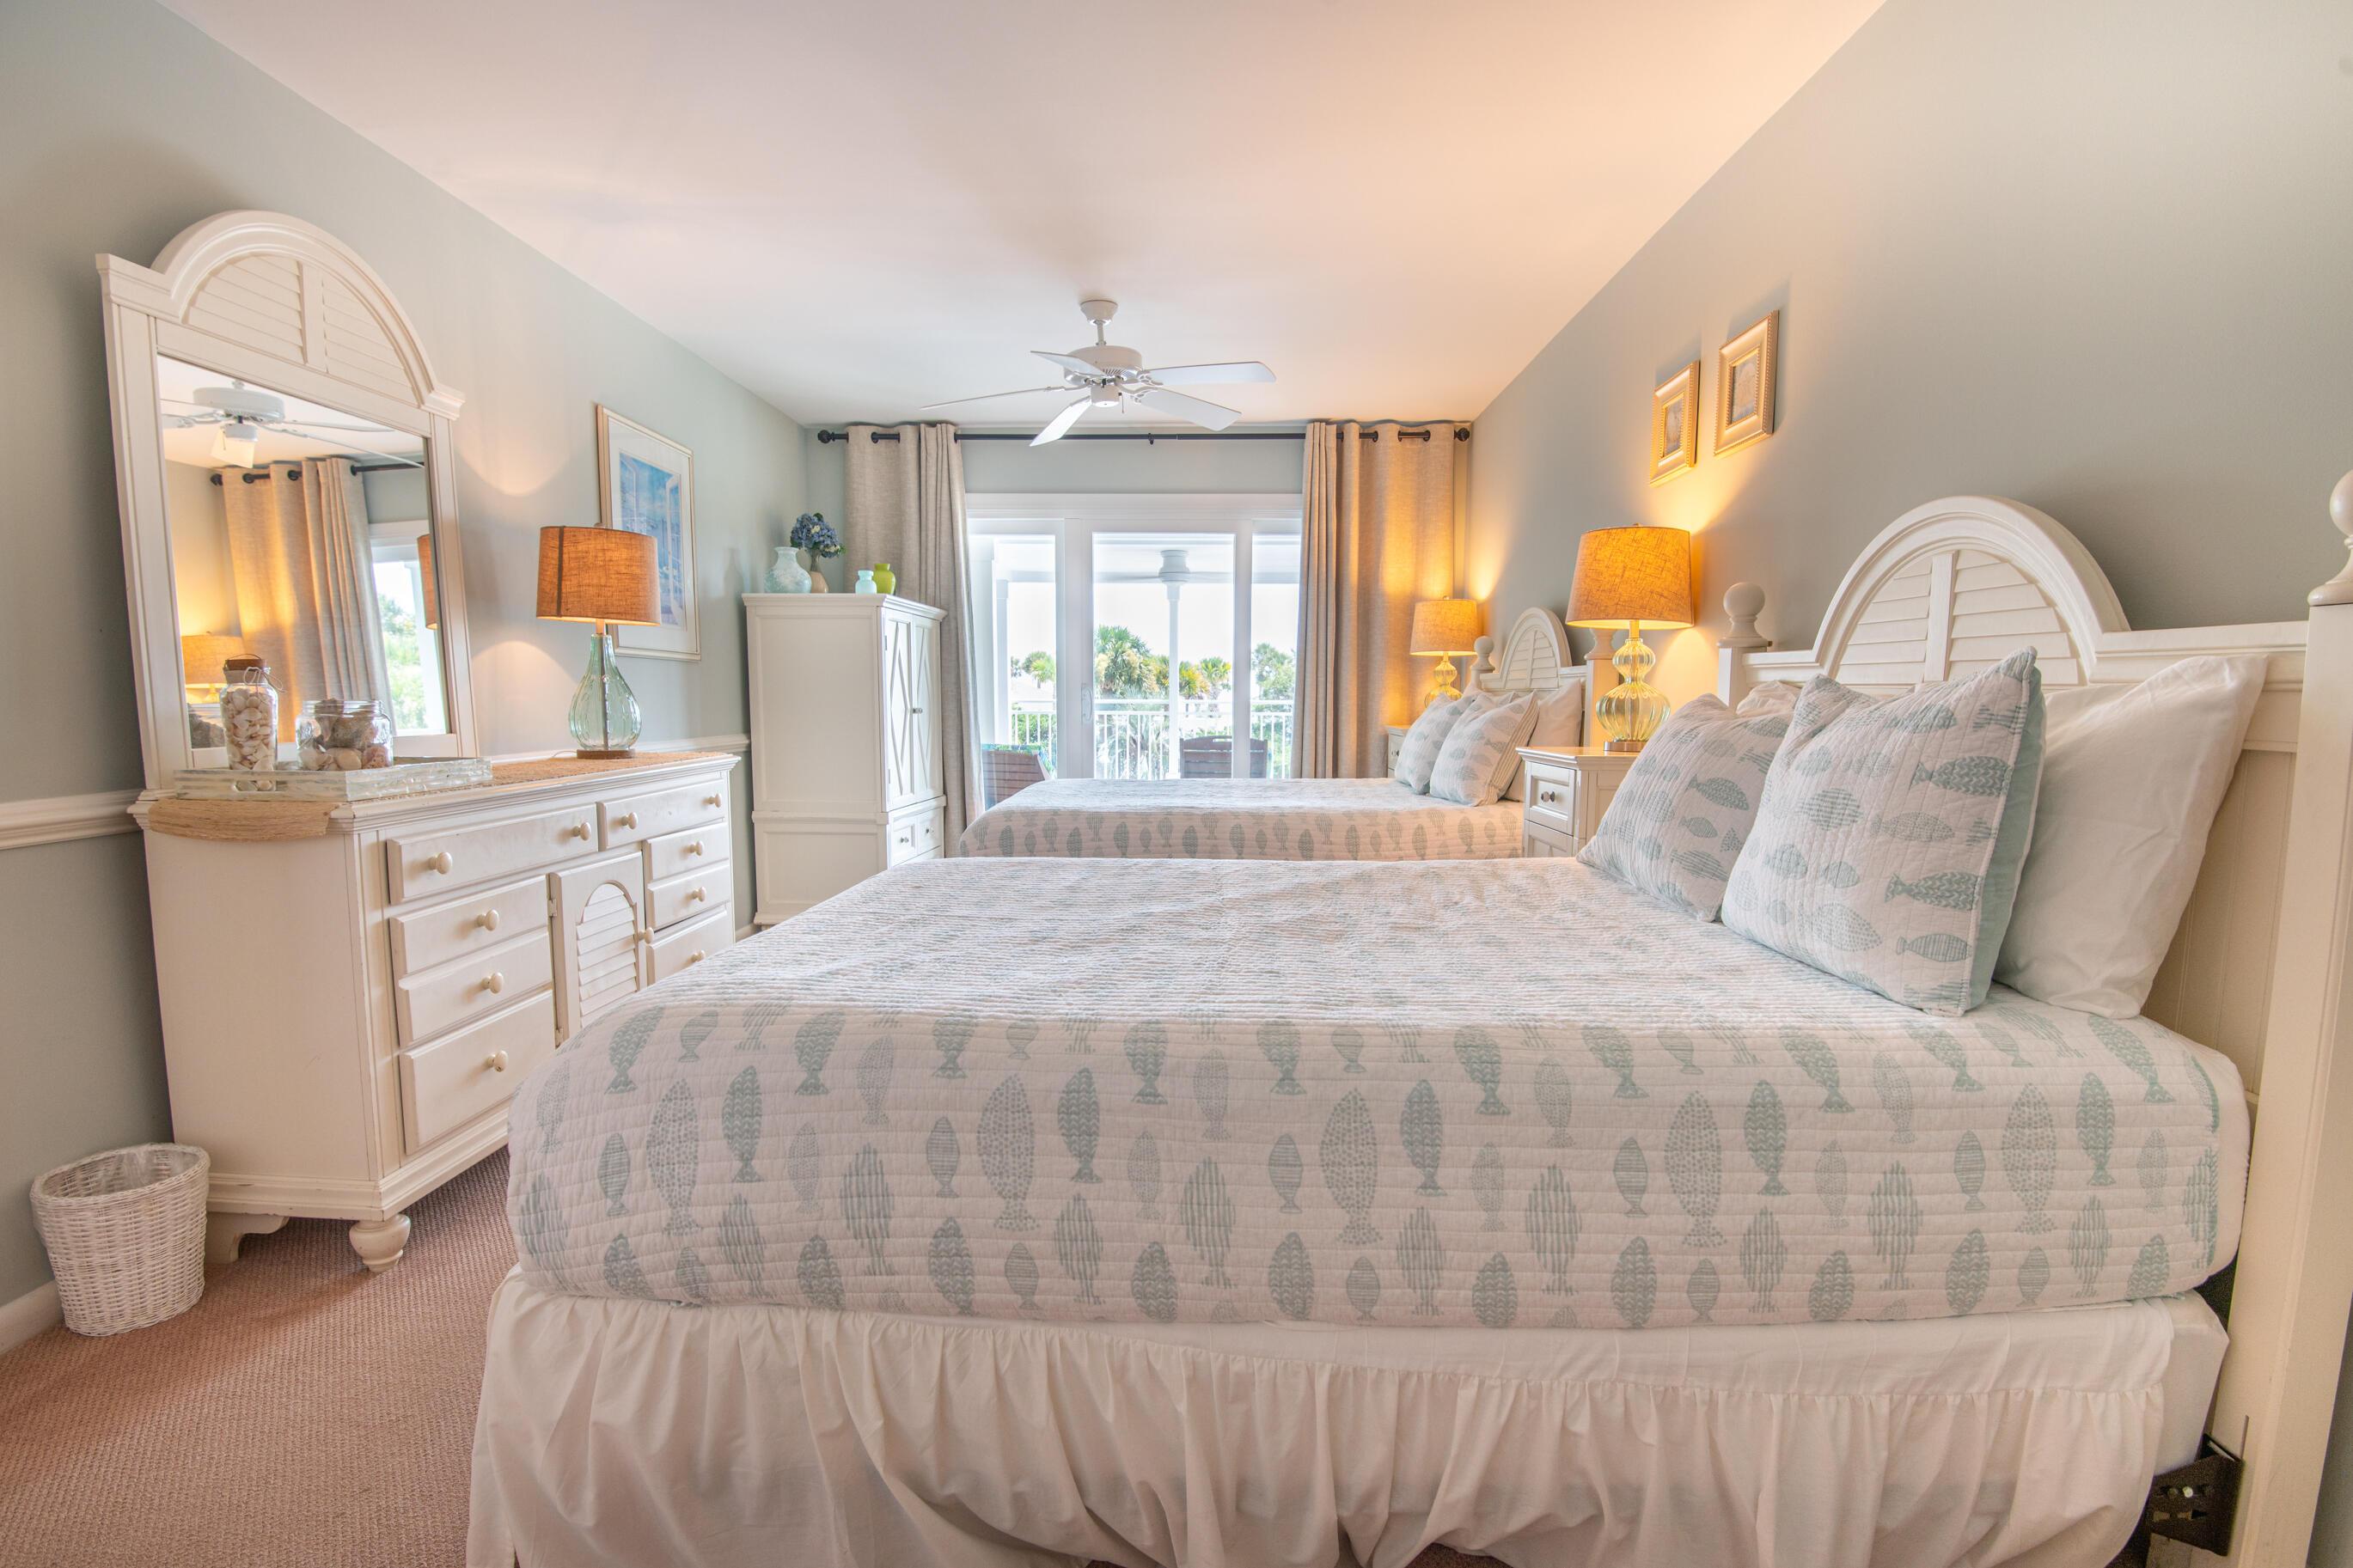 Atrium Villas Homes For Sale - 2935 Atrium Villa, Seabrook Island, SC - 30